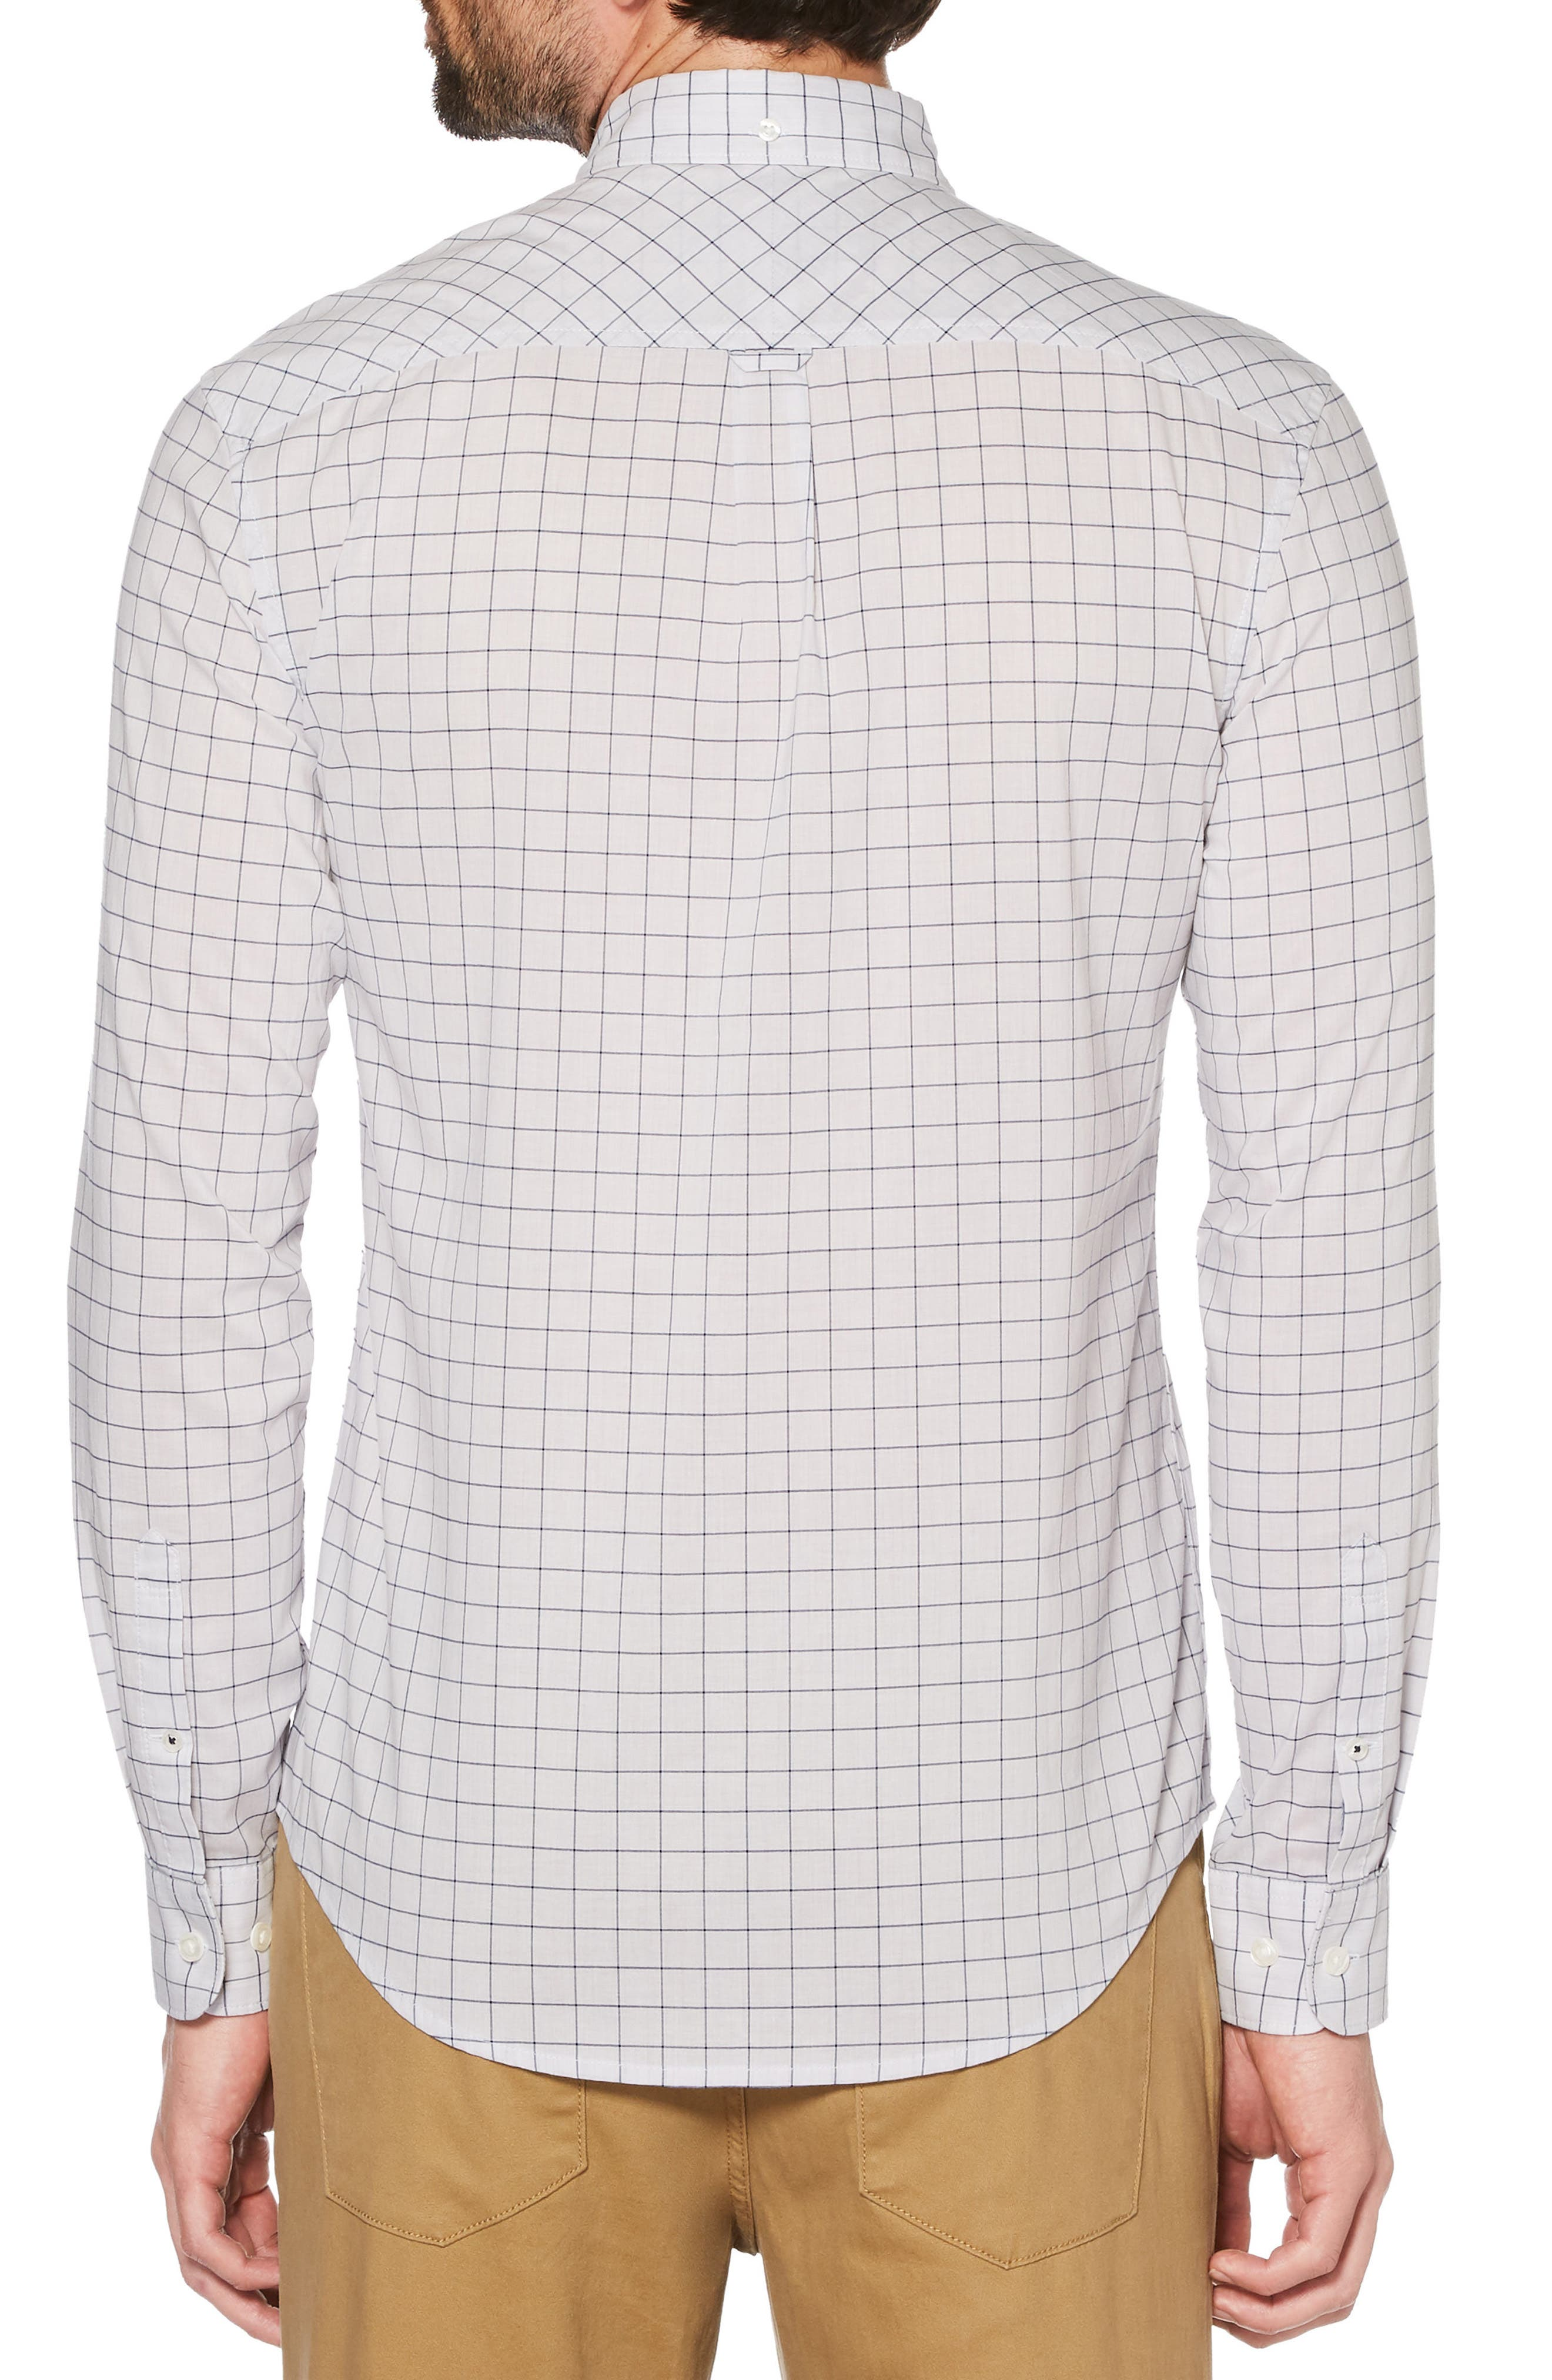 Alternate Image 2  - Original Penguin P55 Slim Fit Shirt